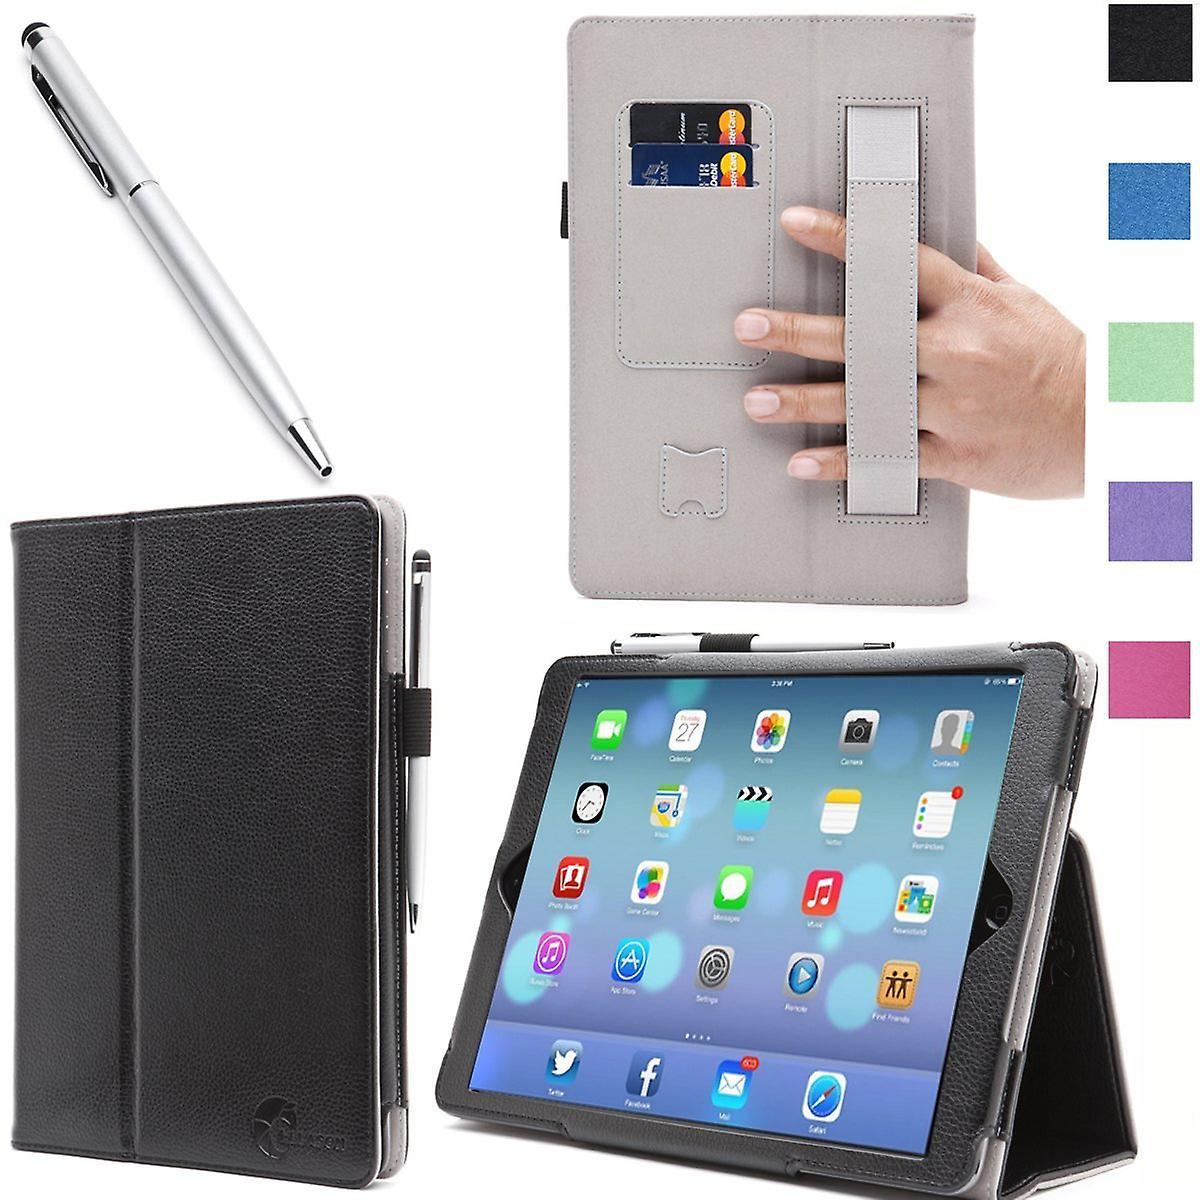 iPad Mini with Retina Display Case, i-Blason, iPad Mini Leather Case with Bonus Stylus-Black